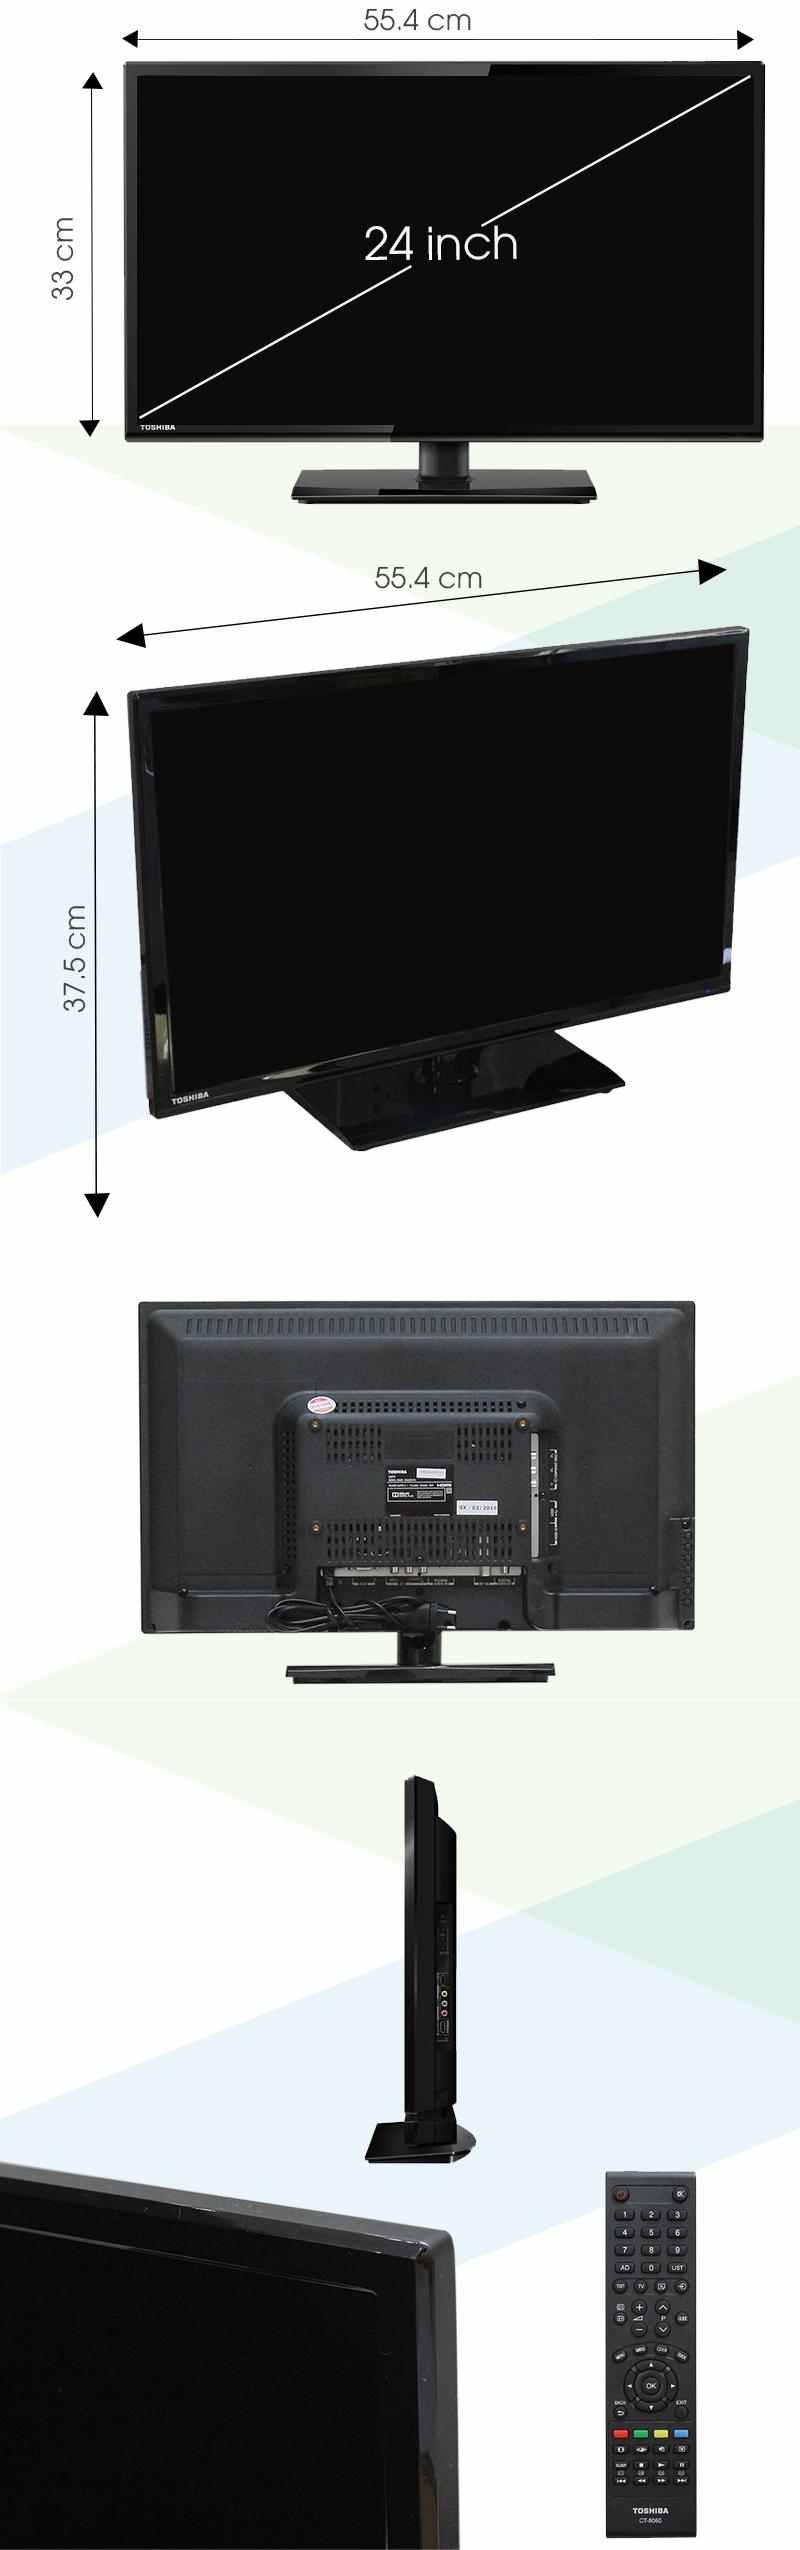 Tivi Toshiba 24 inch 24S2550